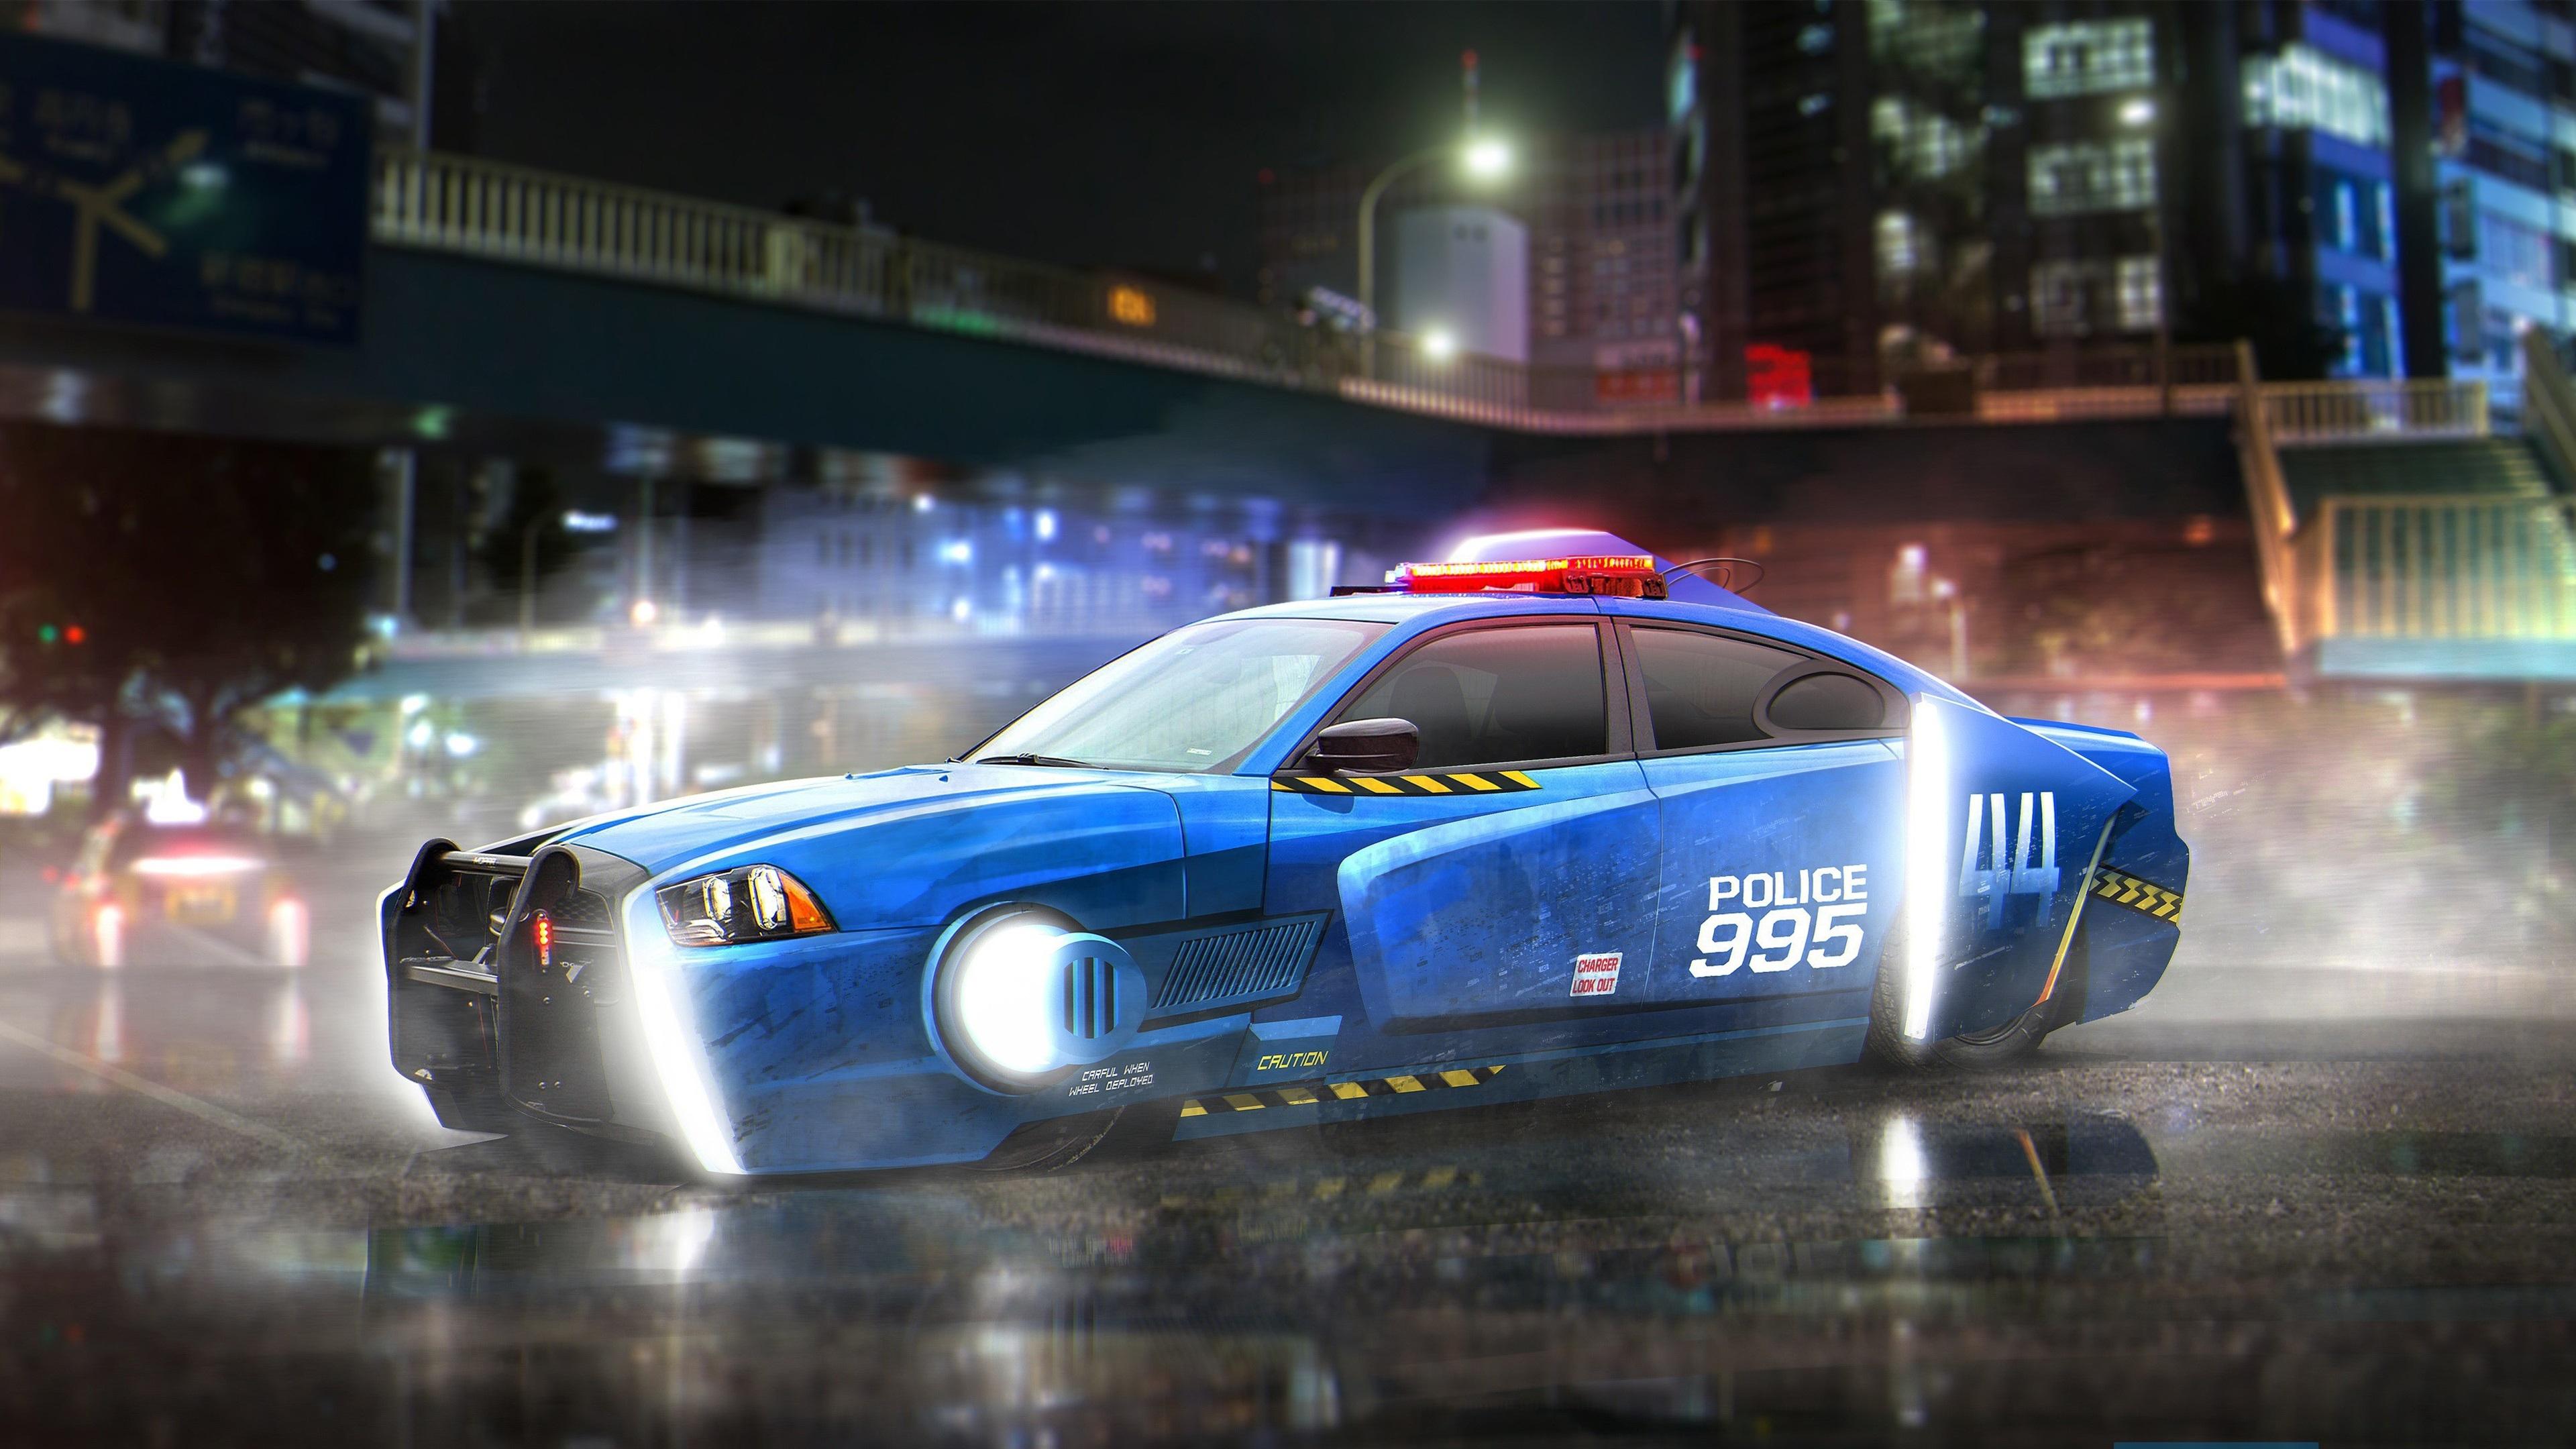 Wallpaper Blade Runner 2049 Dodge Charger Police Car